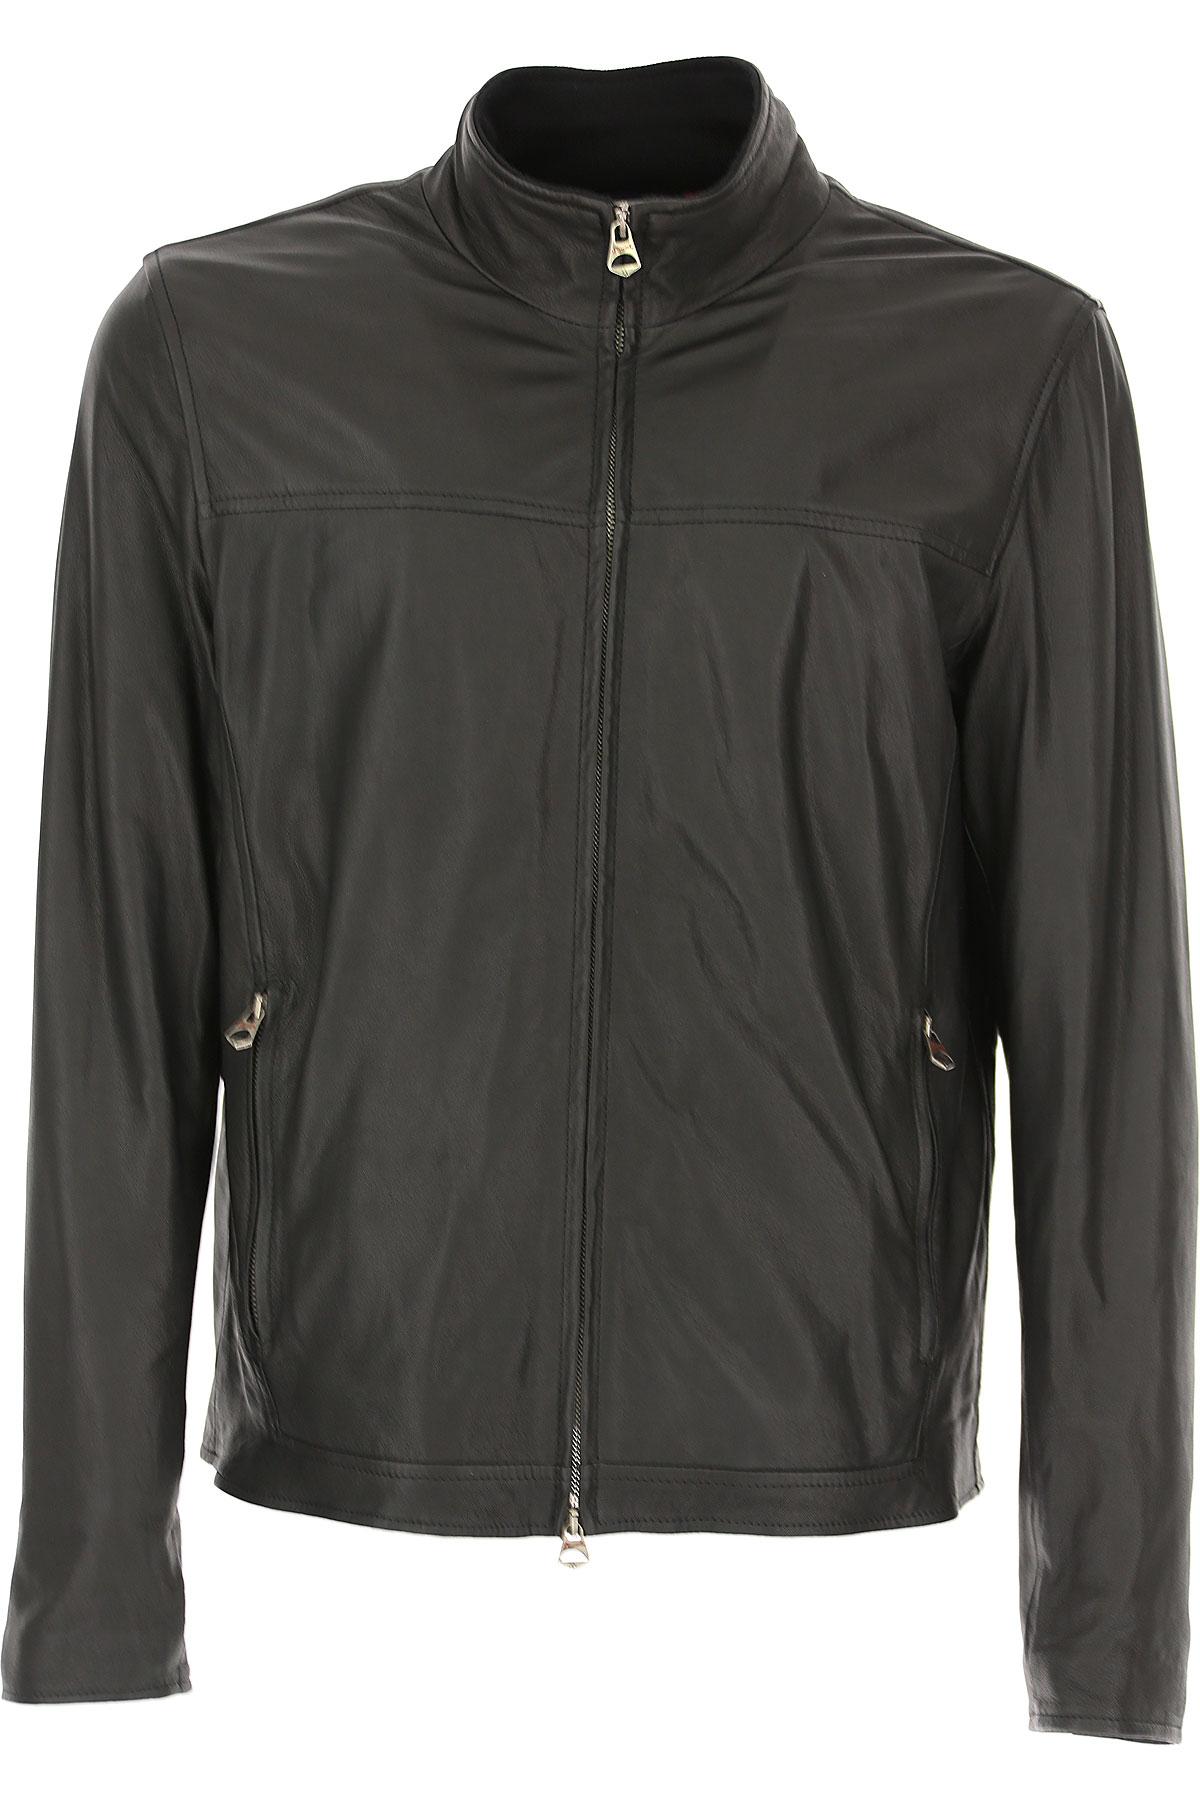 Stewart Leather Jacket for Men On Sale, Black, Leather, 2019, L M XXL